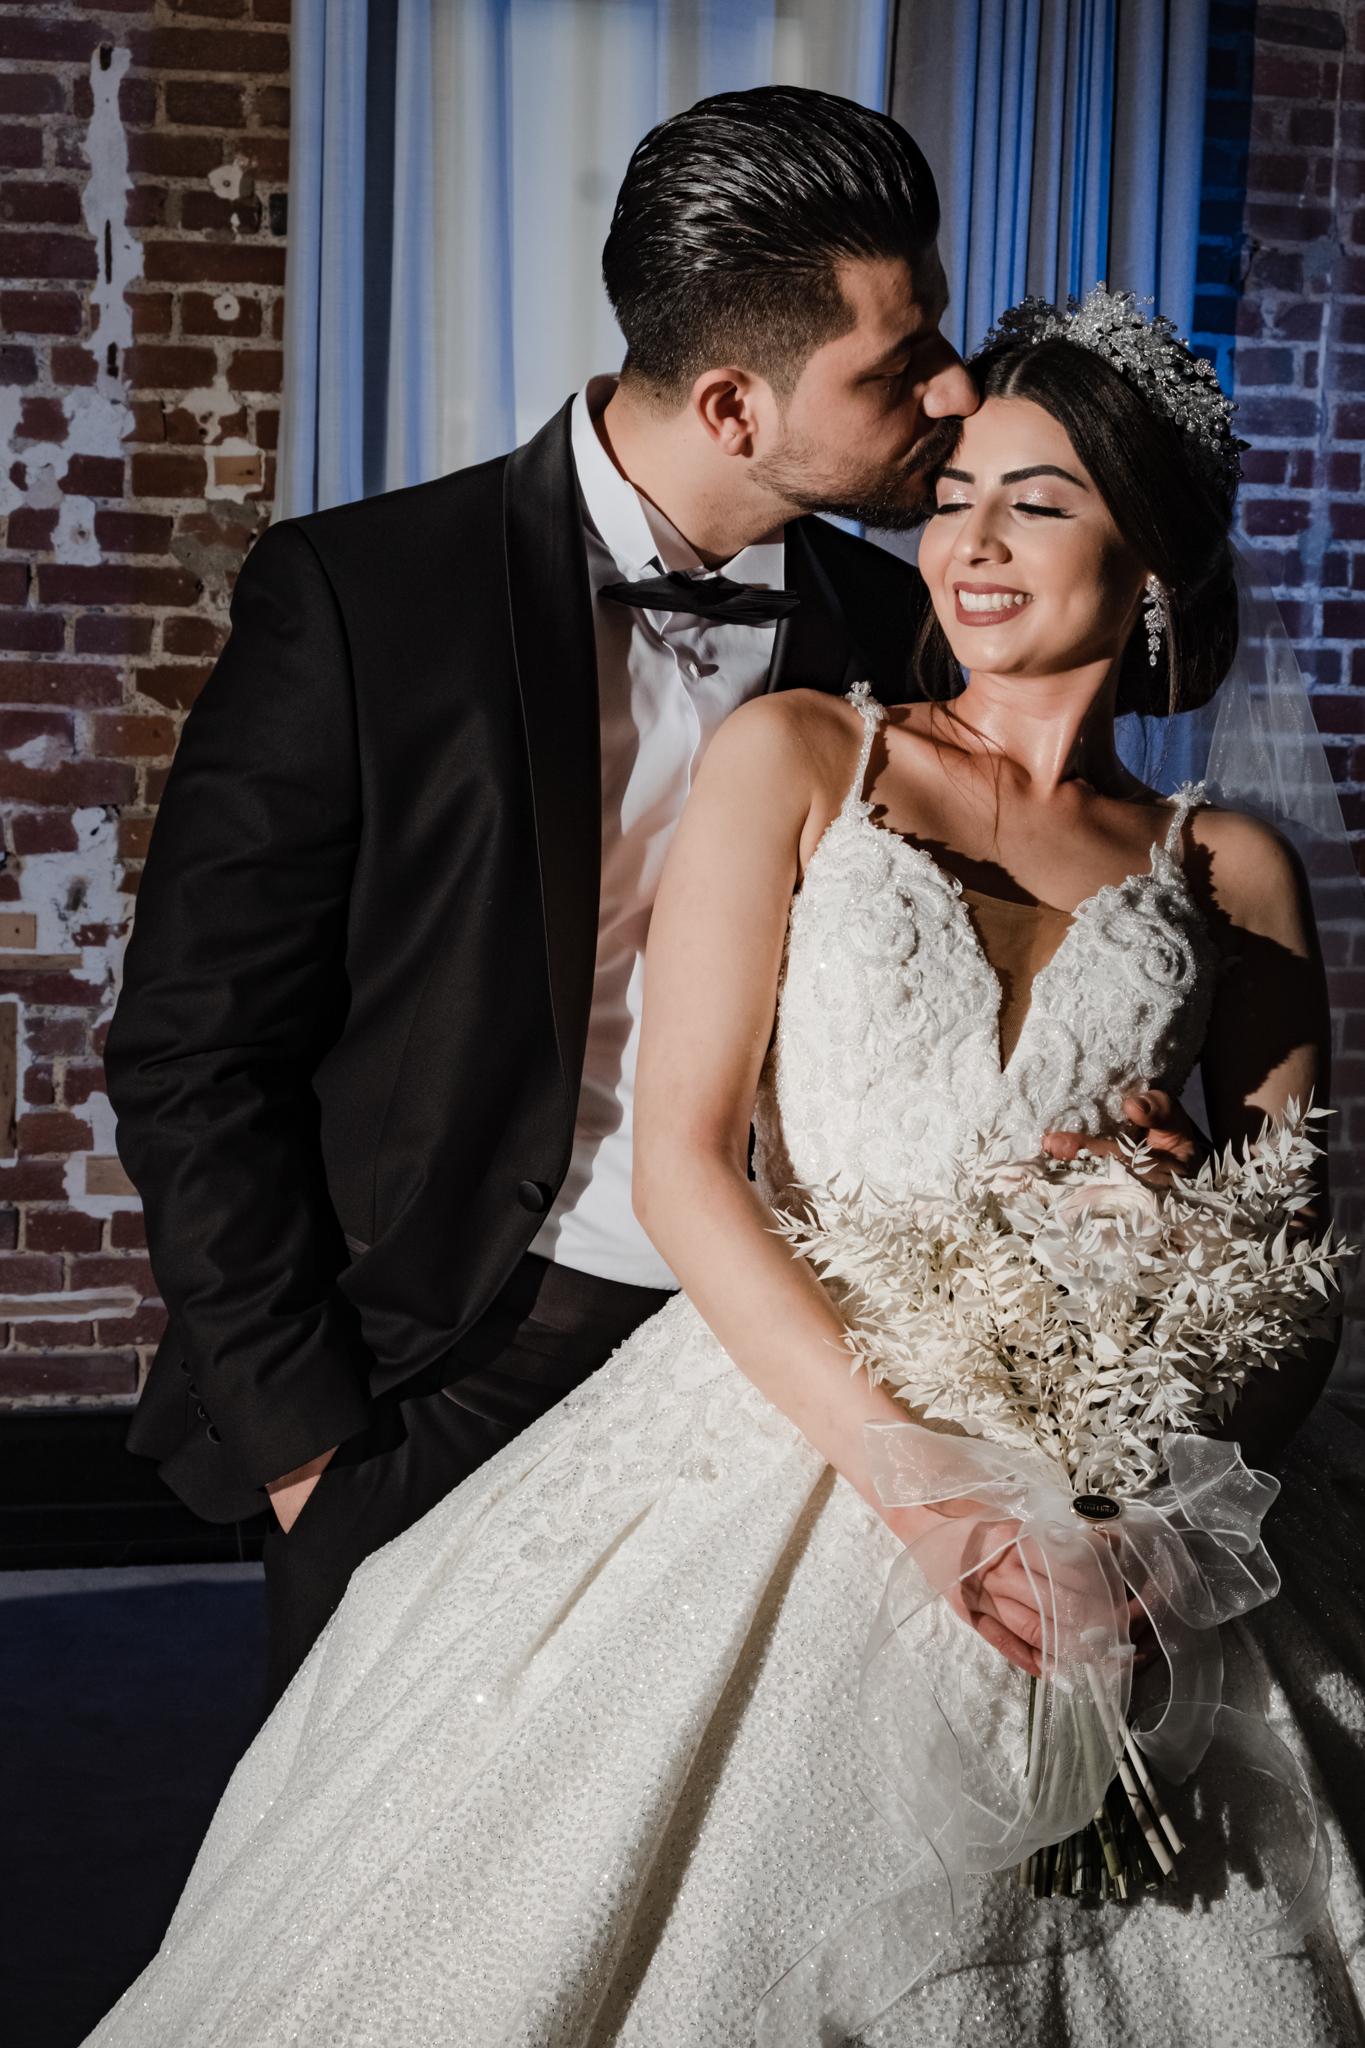 Hochzeitsfotograf Wesel